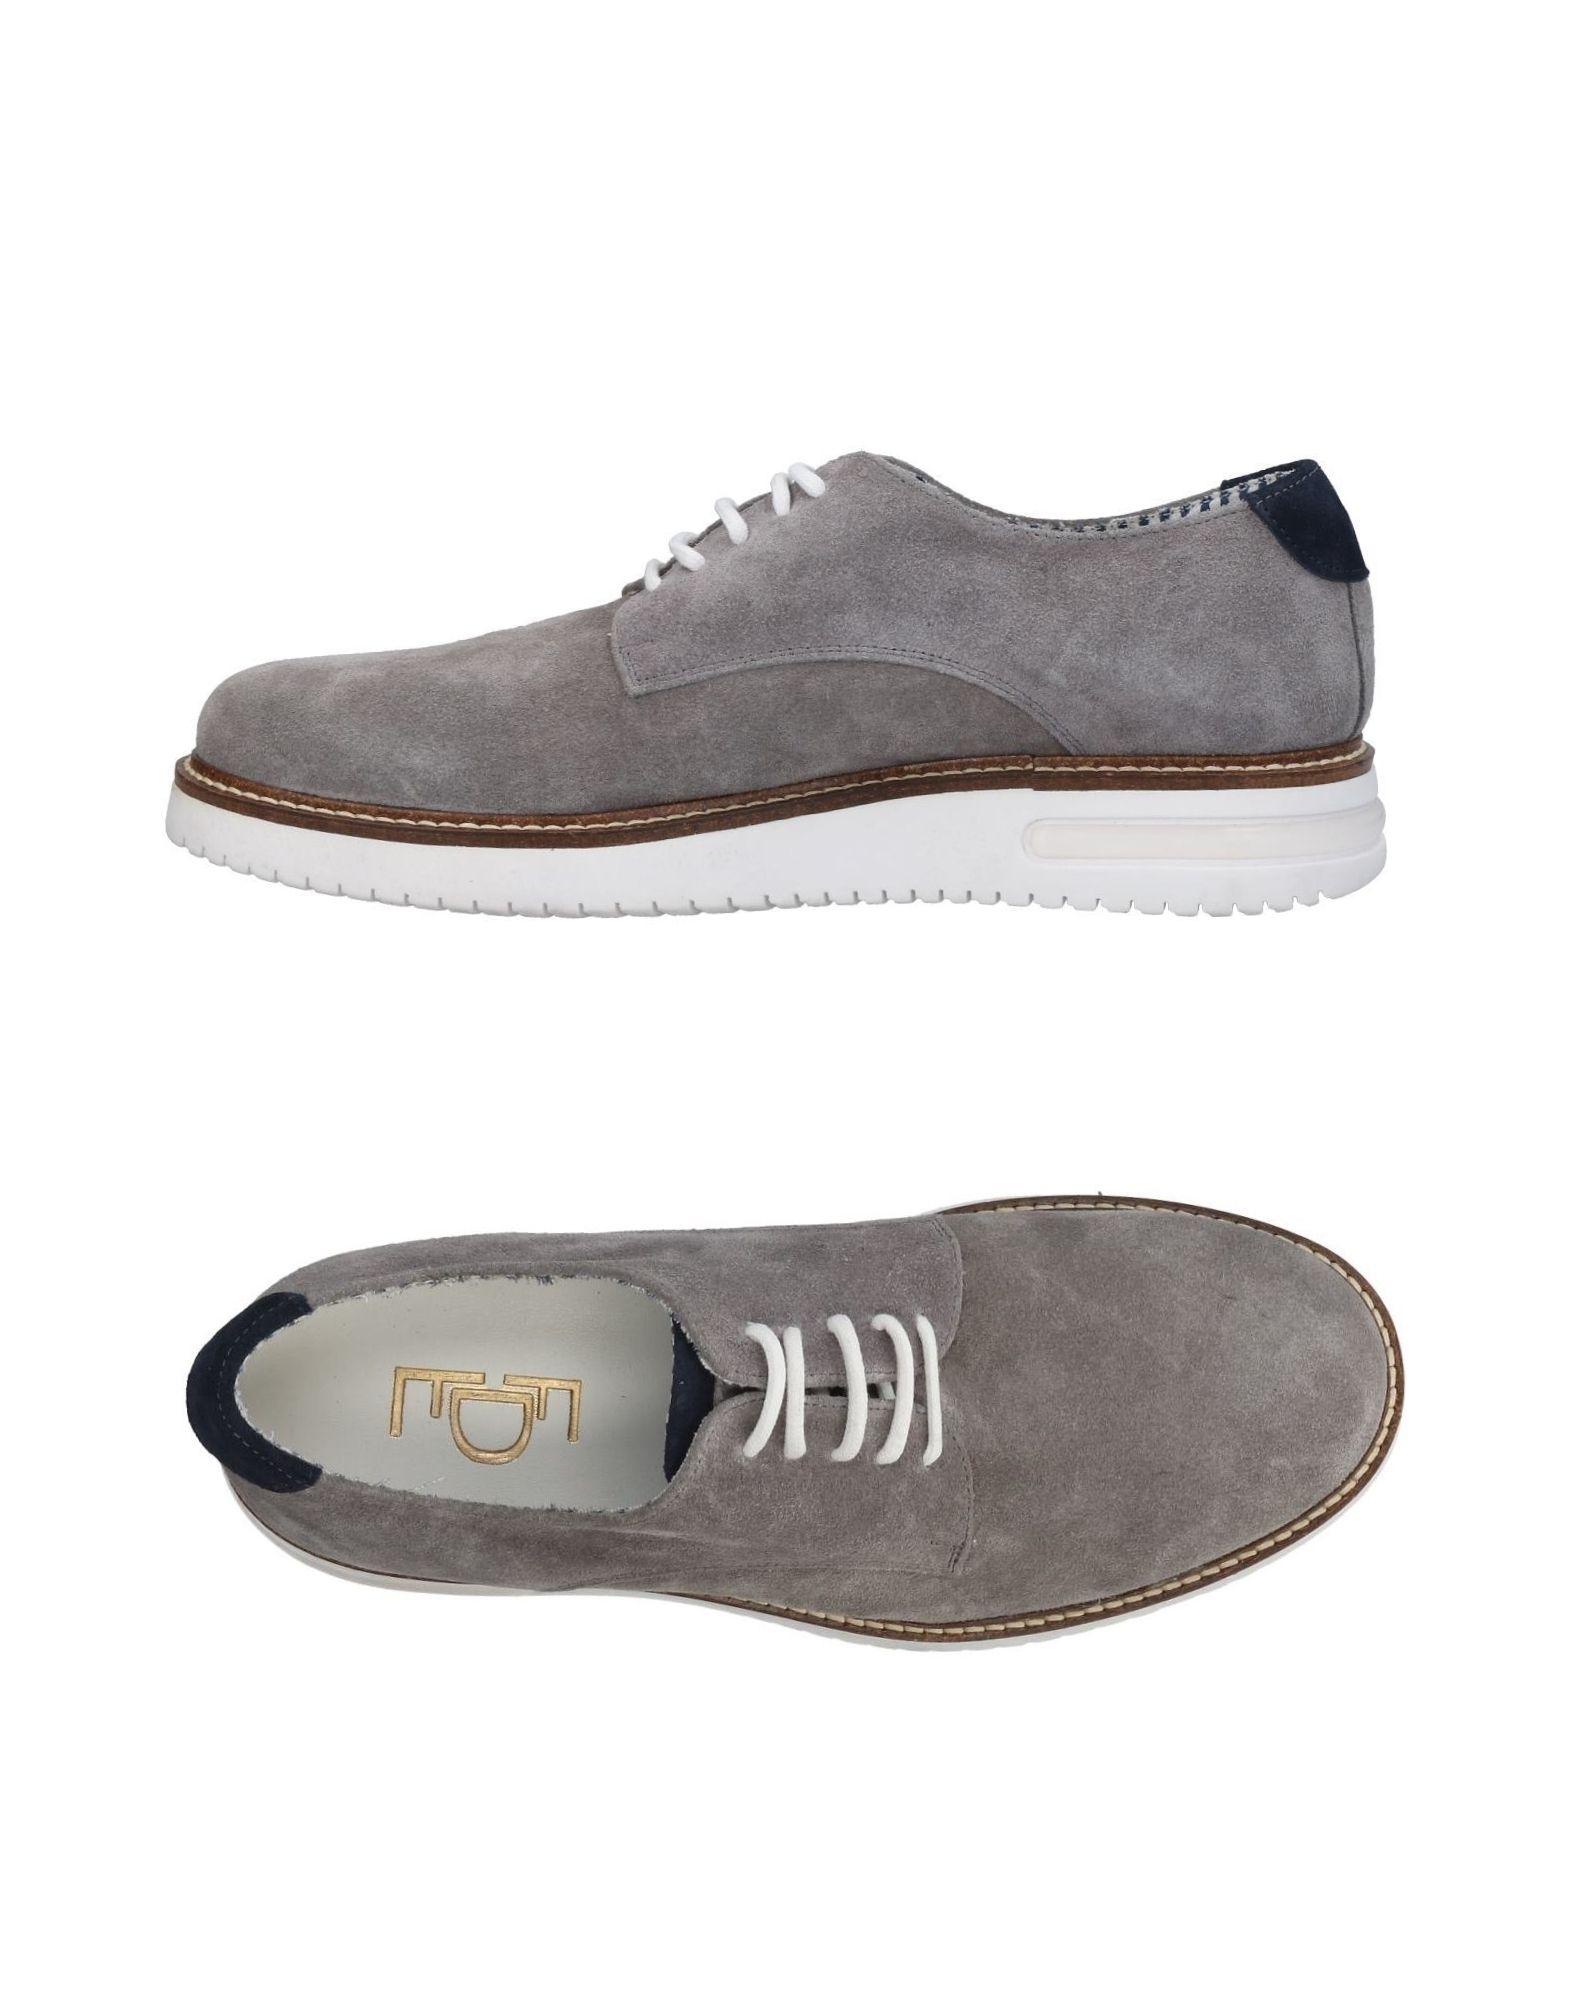 Stringate Fdf Shoes Uomo - 11419577QO